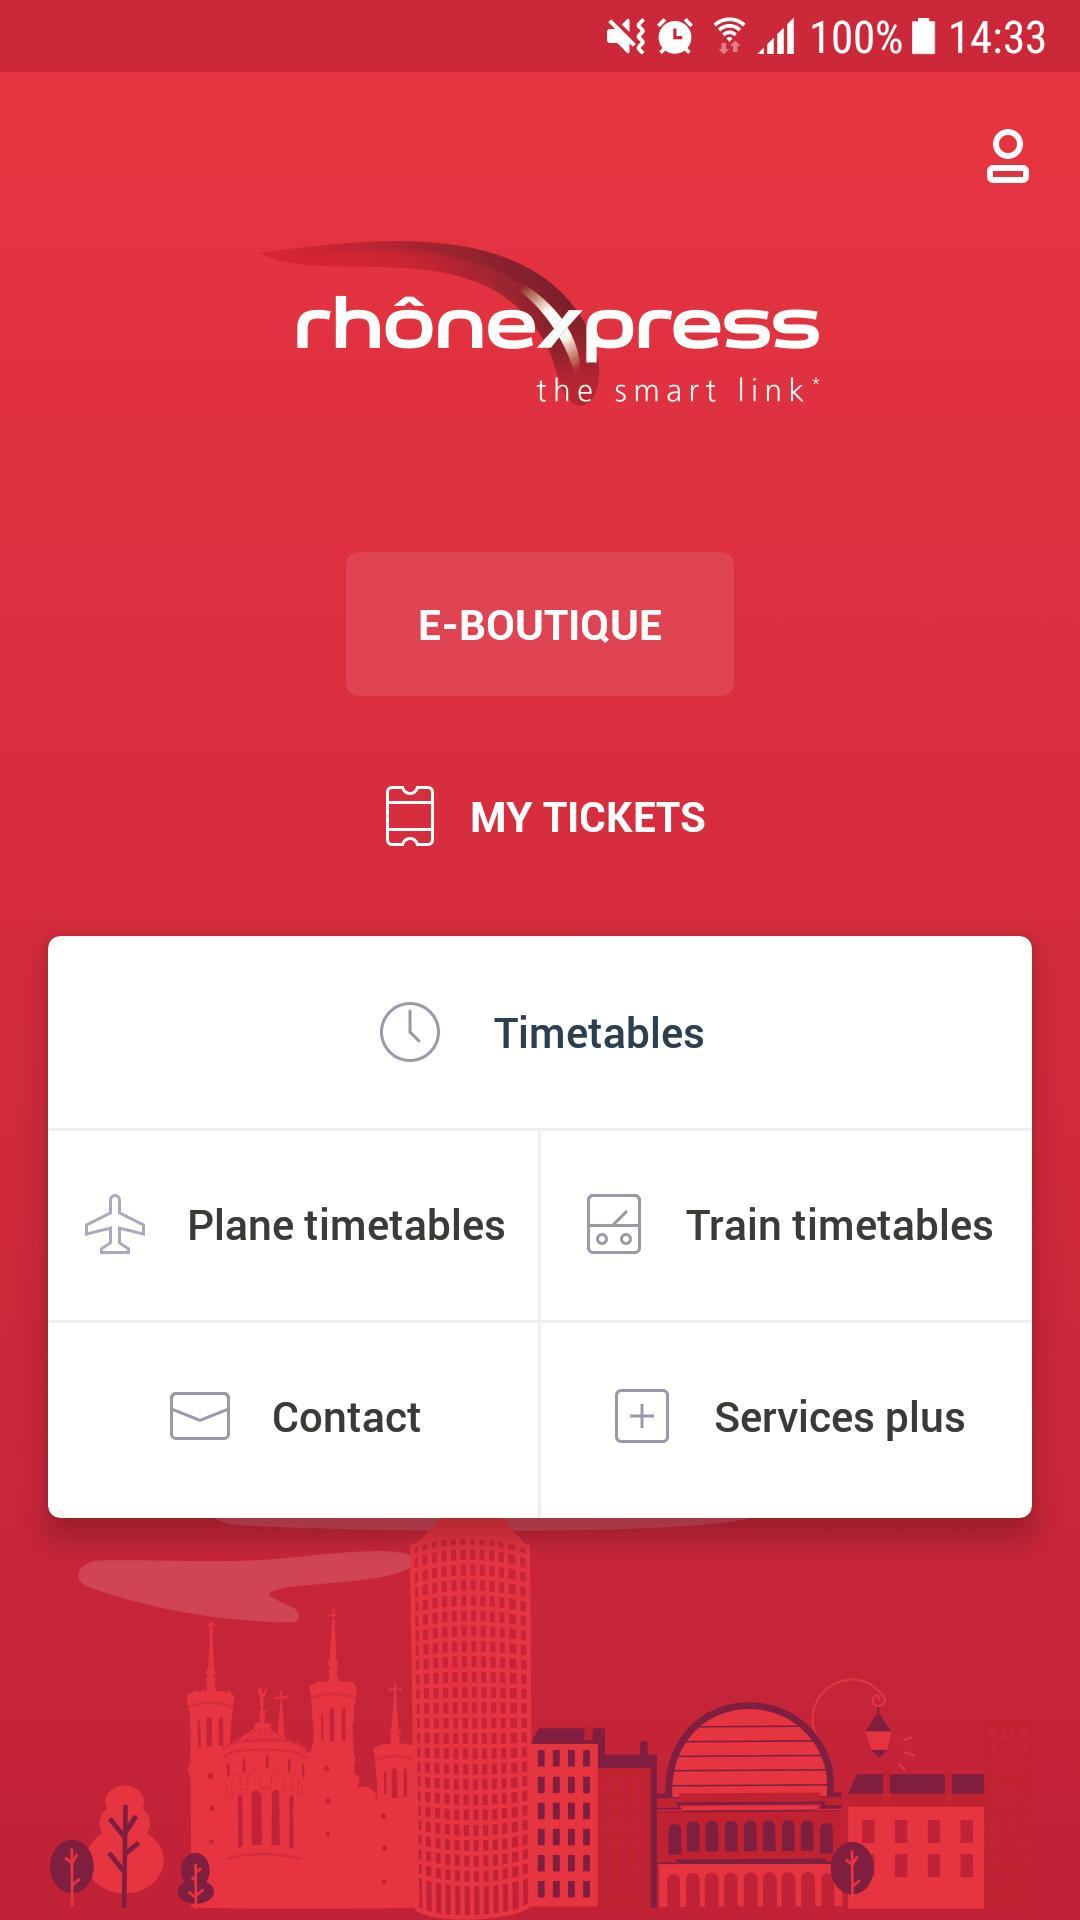 Rhônexpress Airport Lyon 4.0.8 Screenshot 1